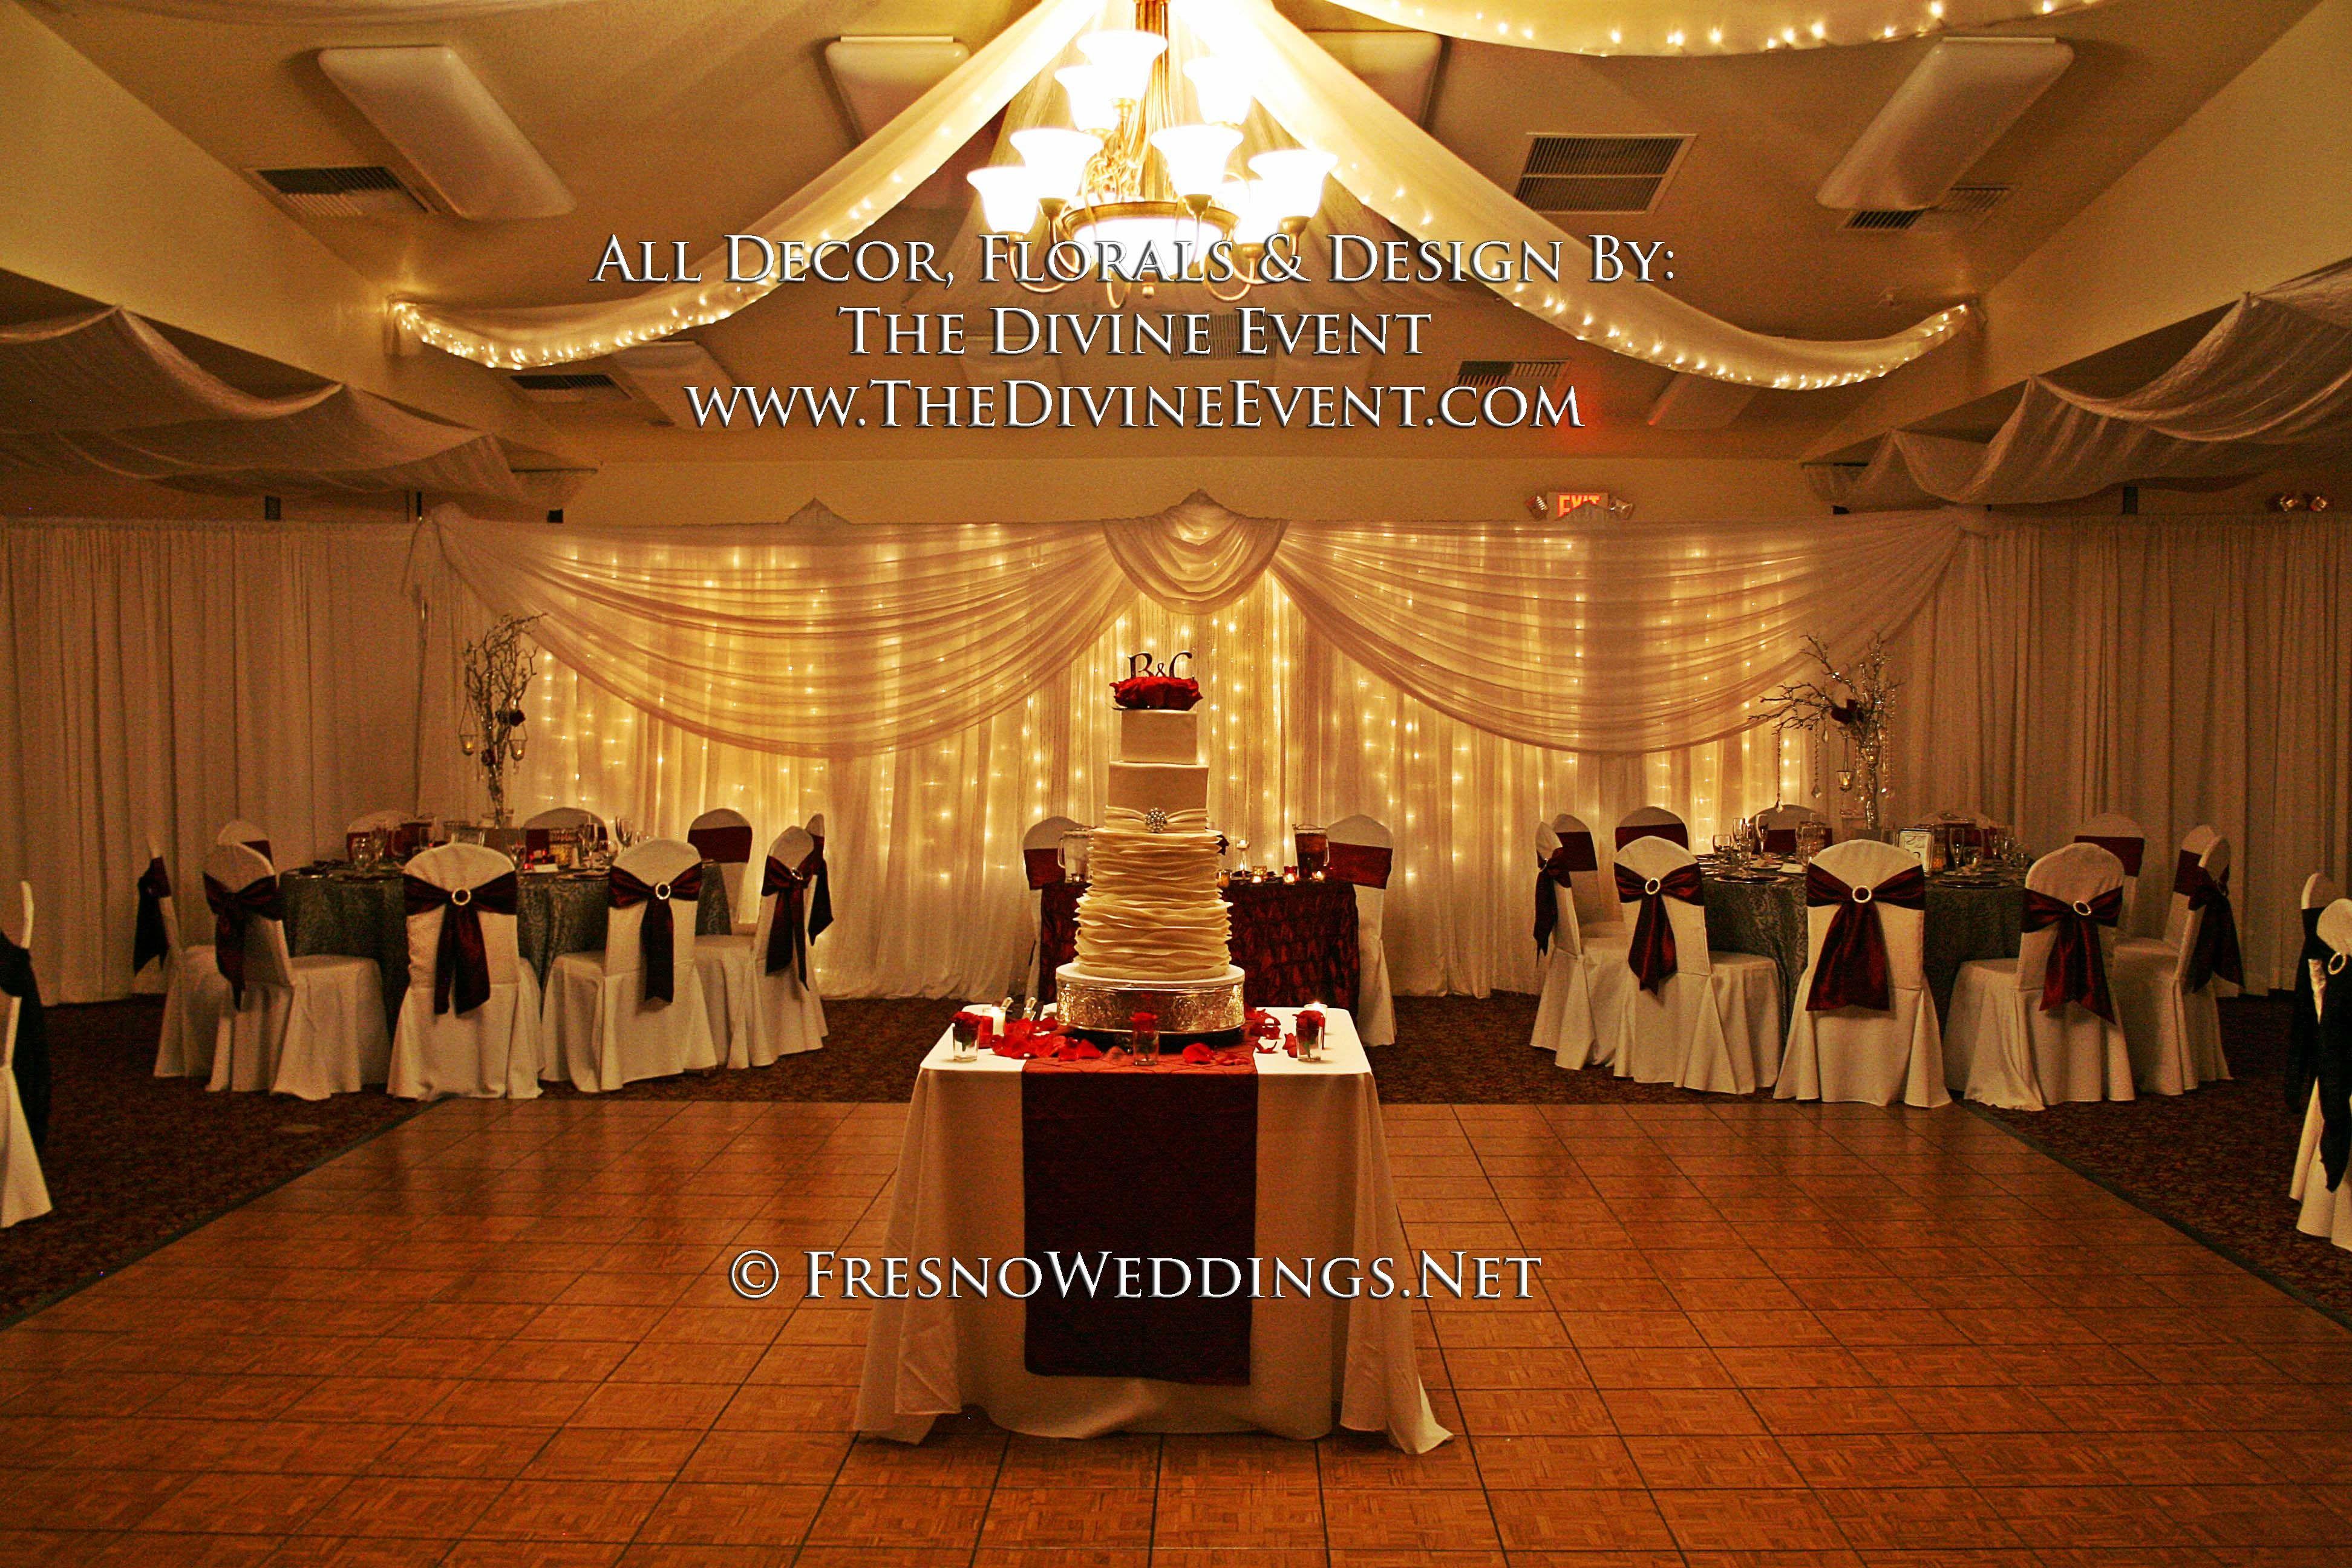 Wedding reception decoration ideas with lights  Central California Weddings  CentralValleyWedding